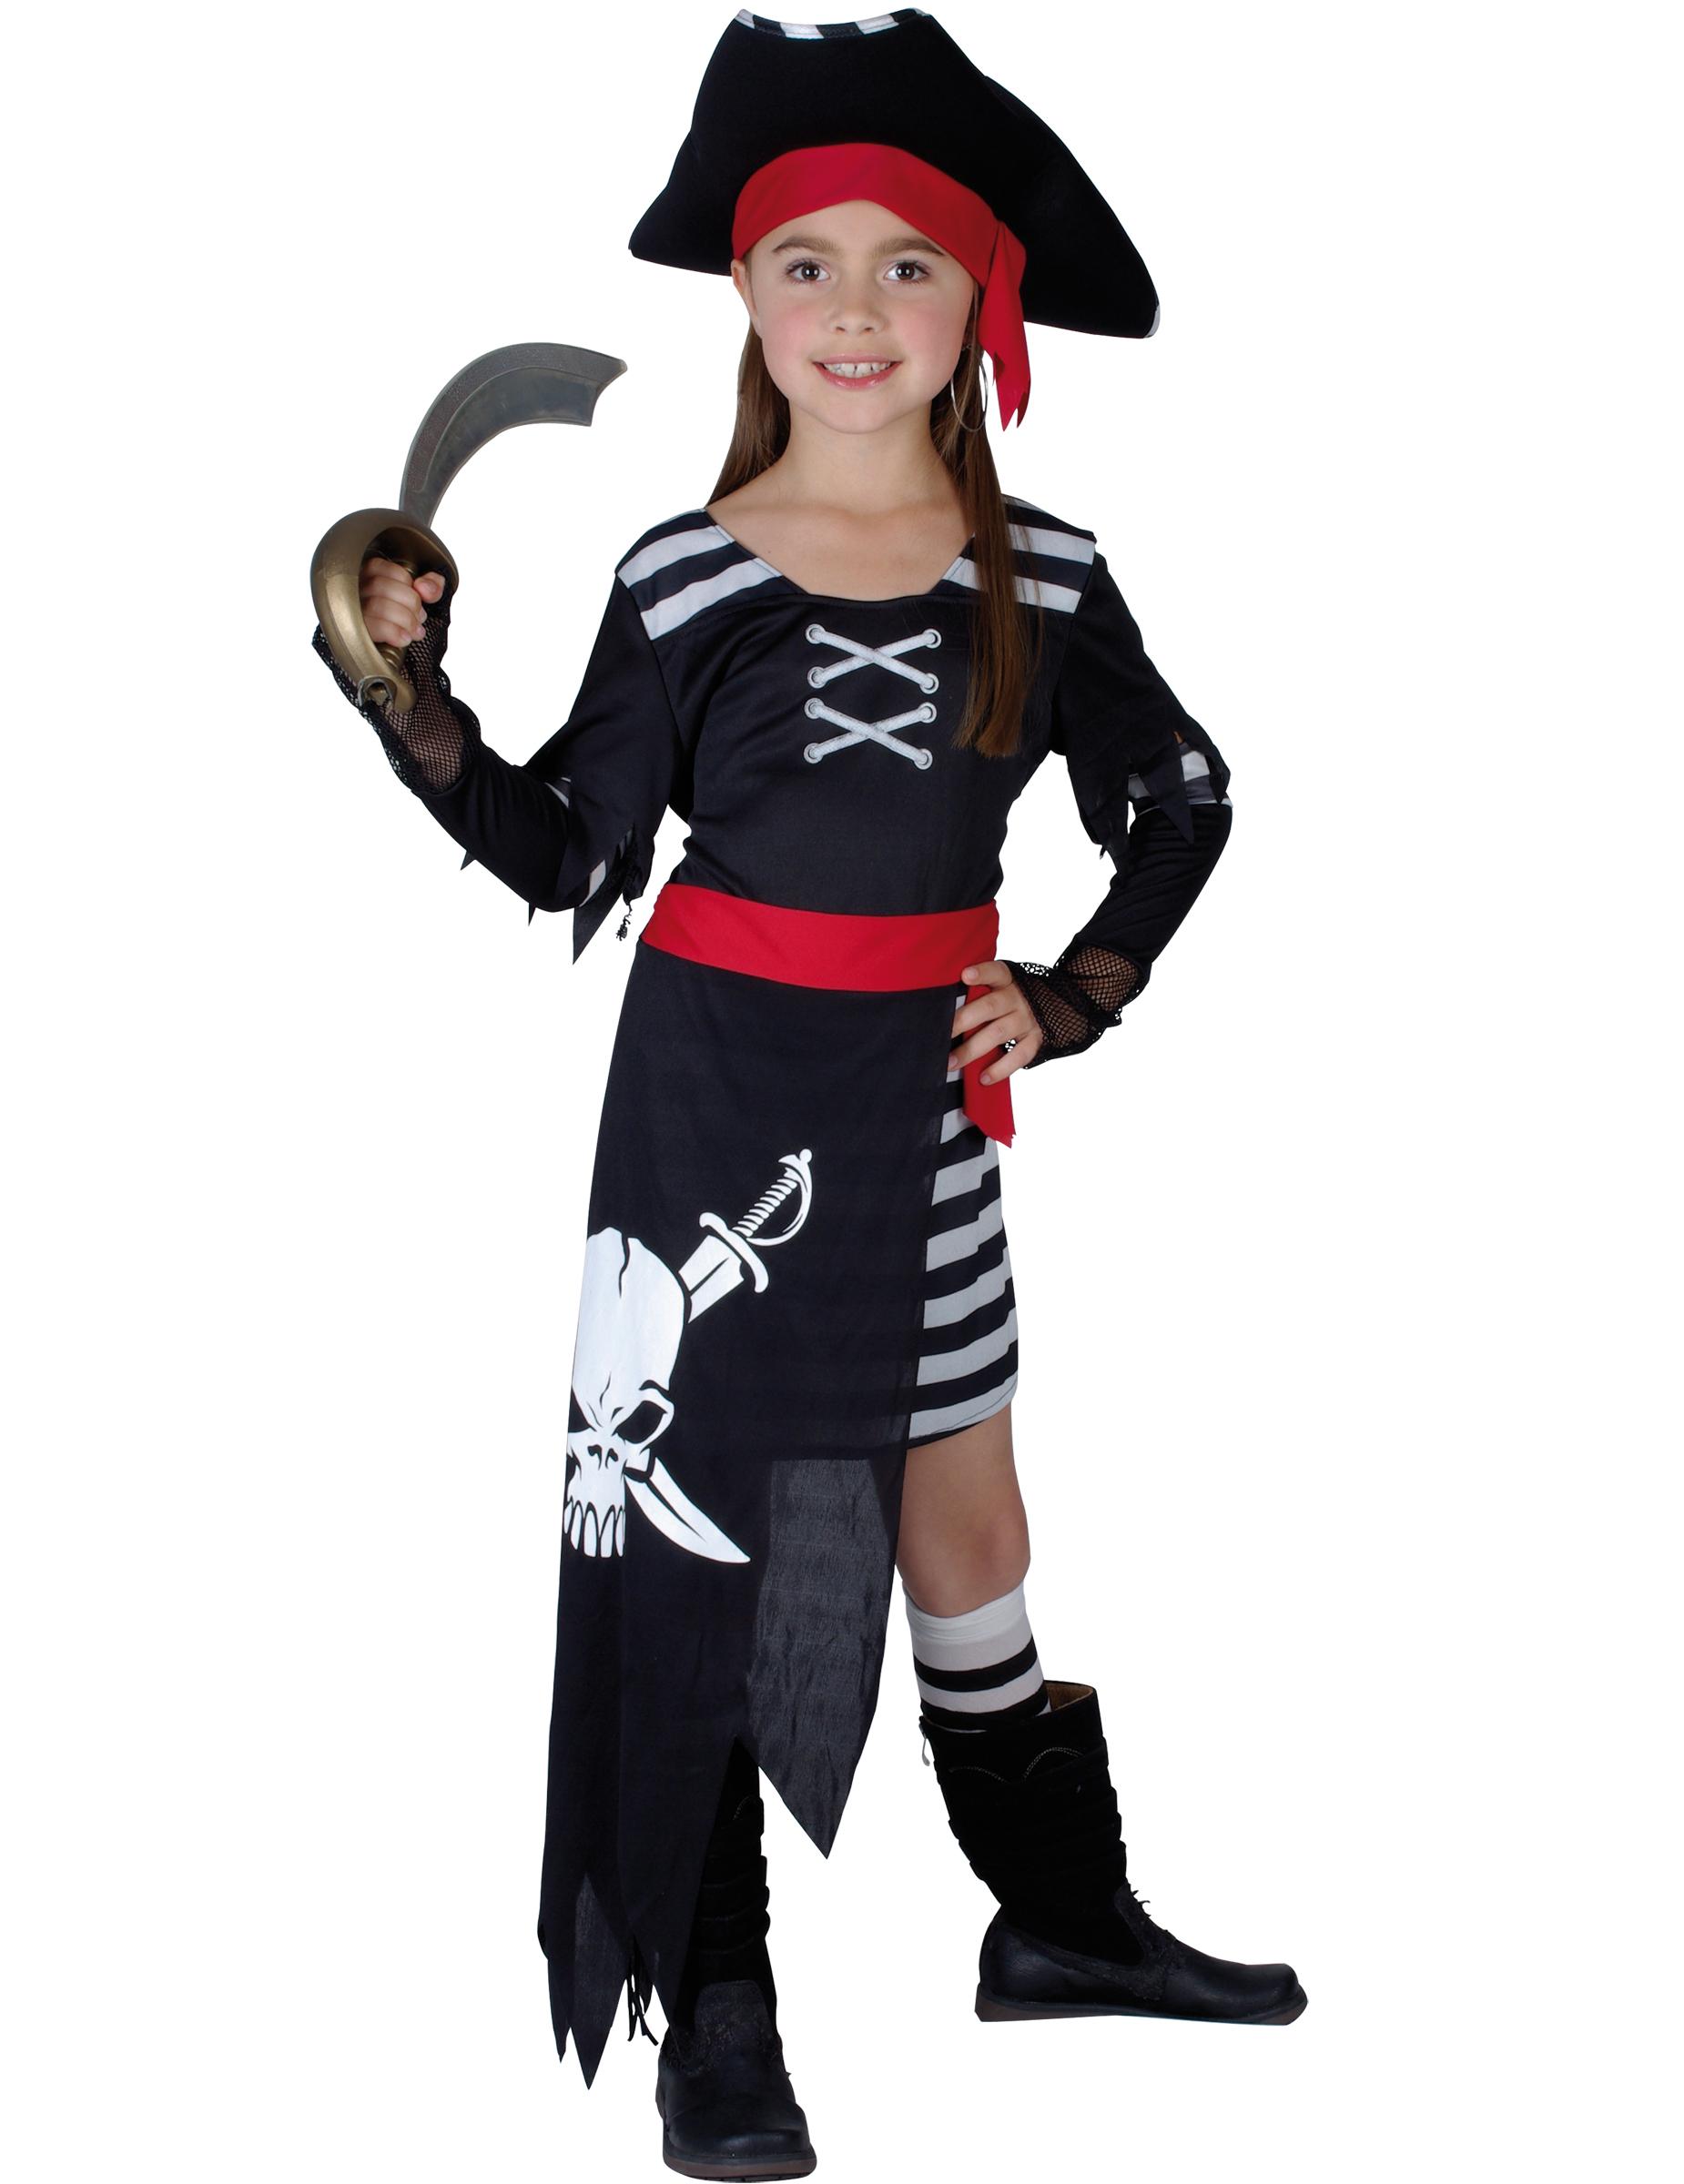 Déguisement Pirate Fille Costume